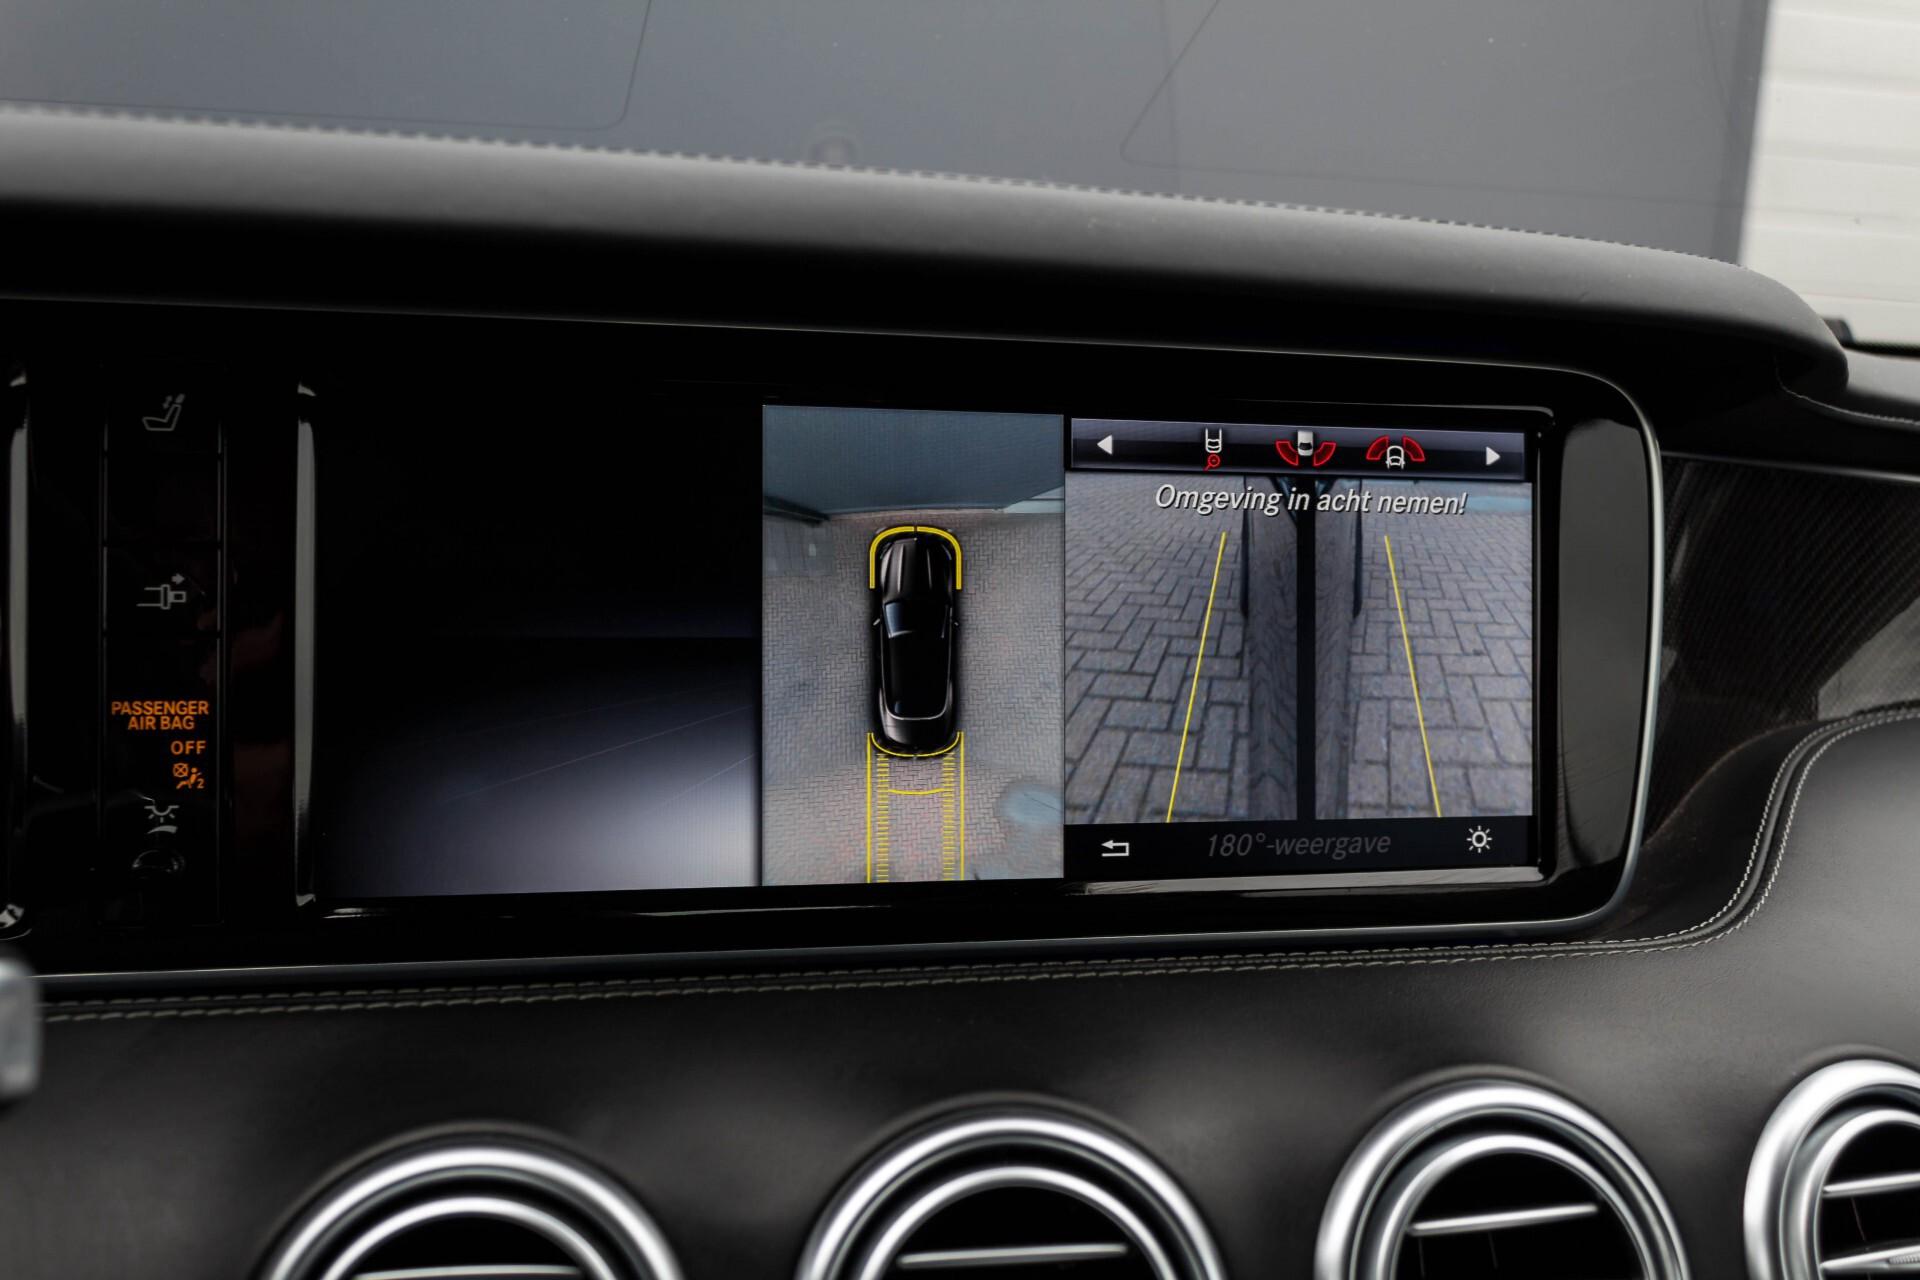 Mercedes-Benz S-Klasse Cabrio 63 AMG 4-M Ceramic/Designo/Carbon/Burmester High End Aut Foto 21